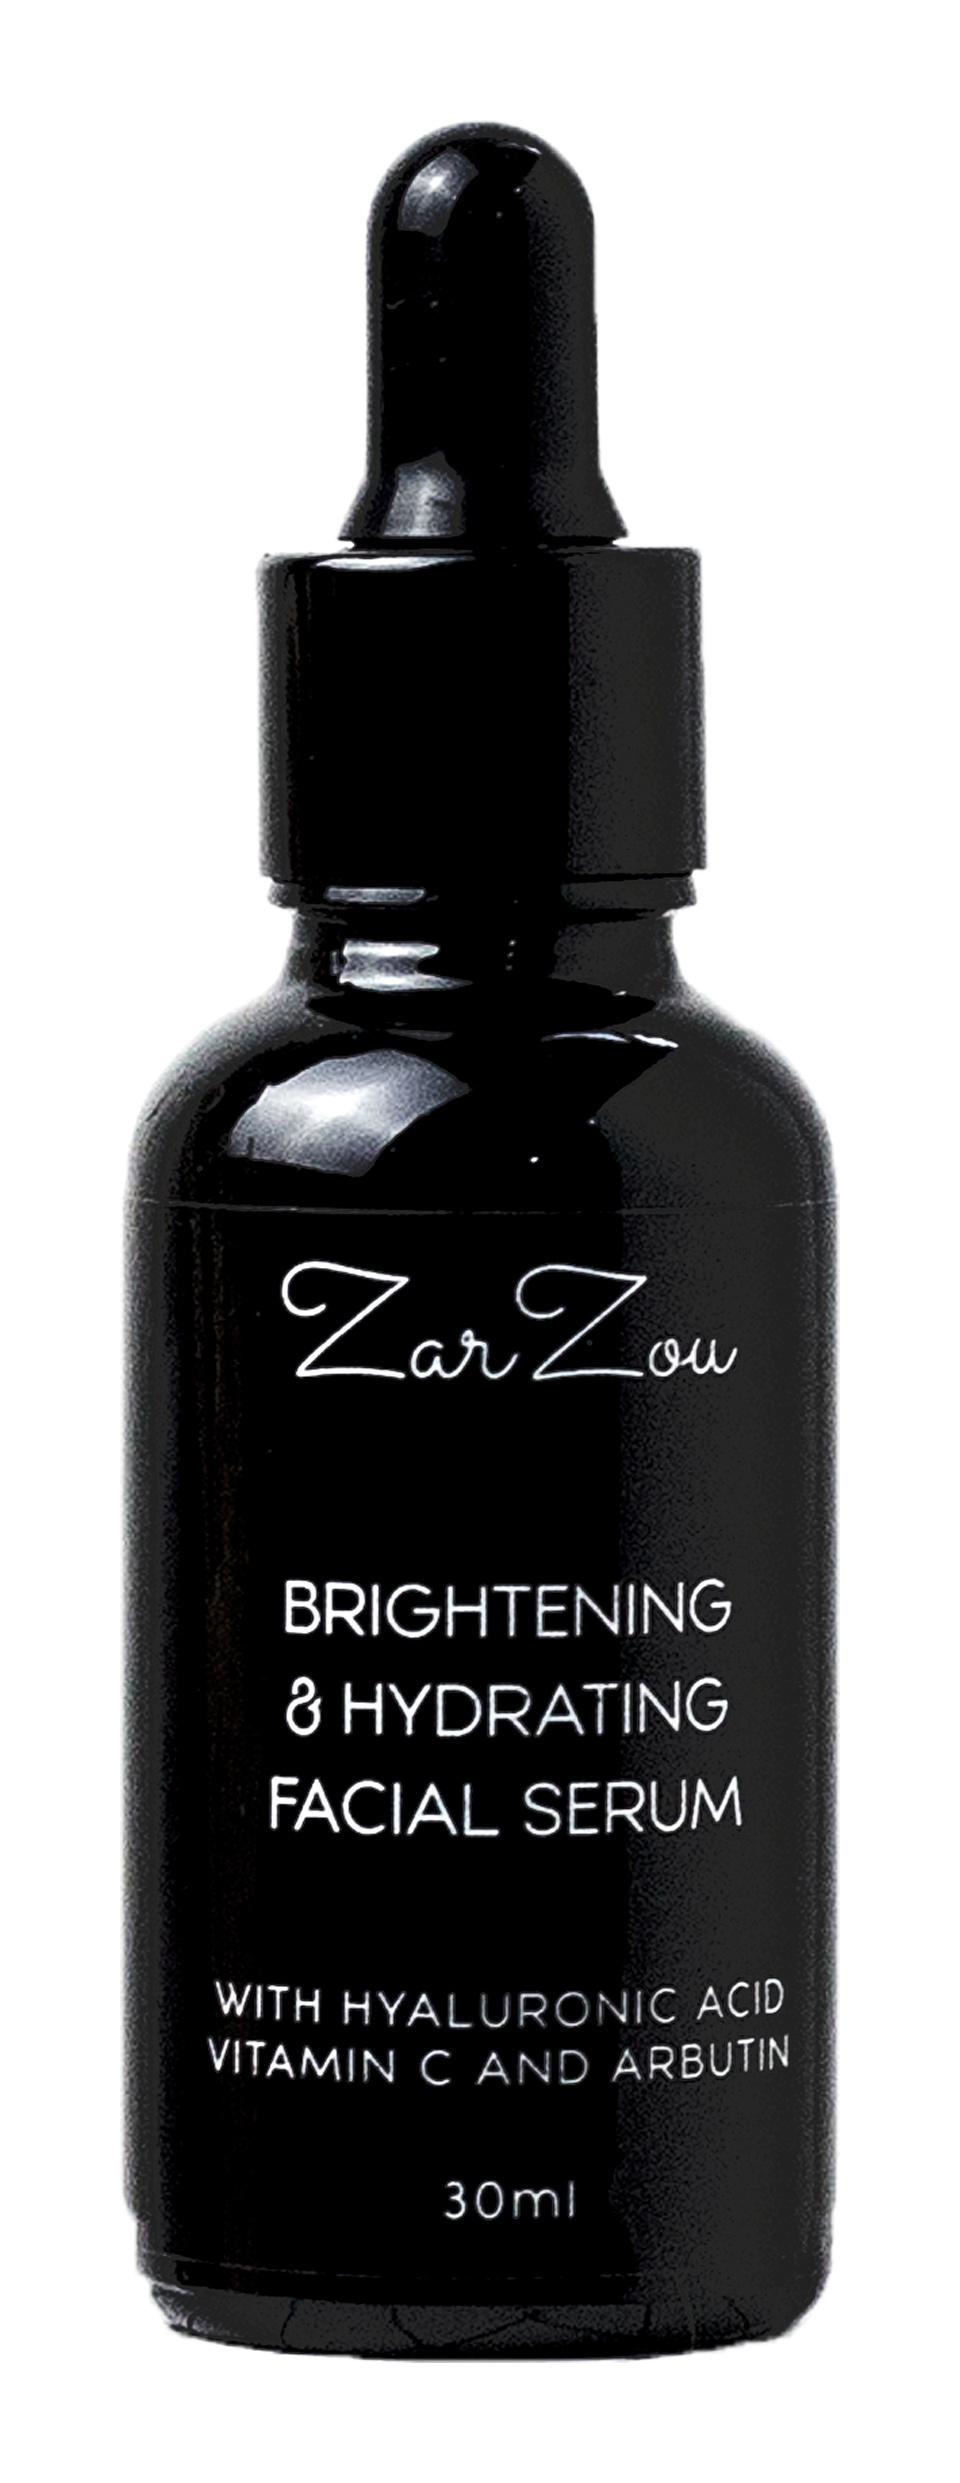 ZARZOU Brightening & Hydrating Facial Serum